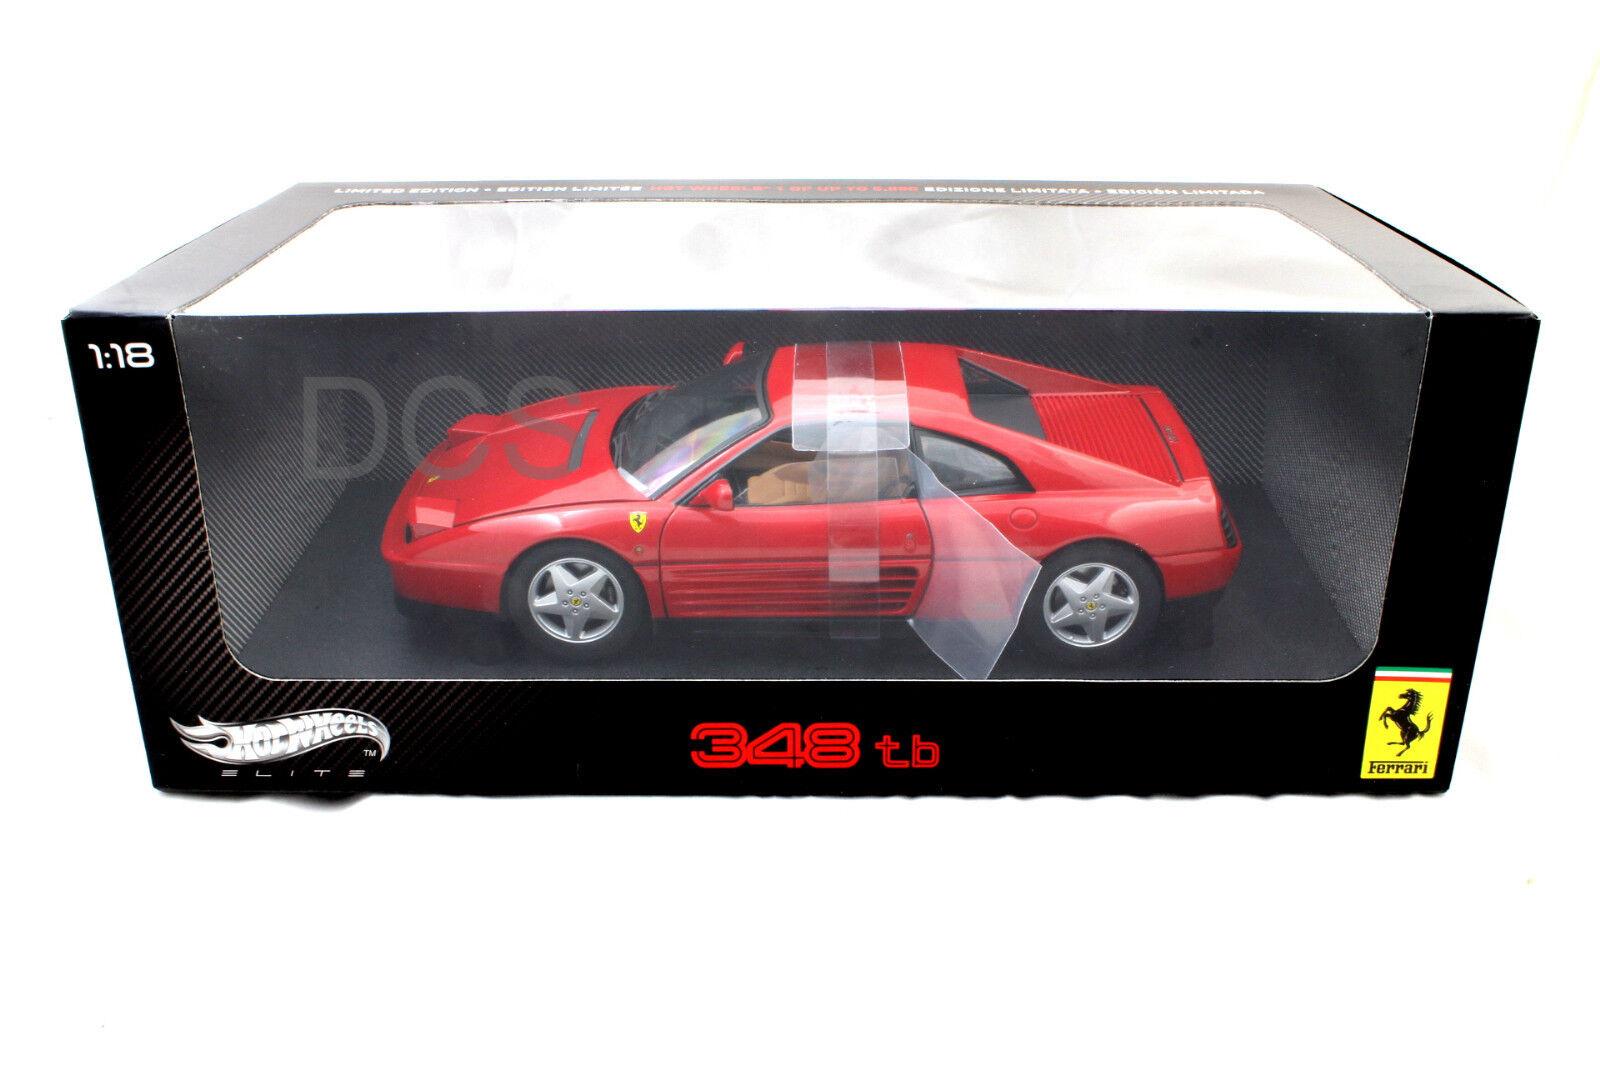 Hot Wheels Elite Edición 1989 Ferrari 348 Tb rosso 1 18 Diecast v7436